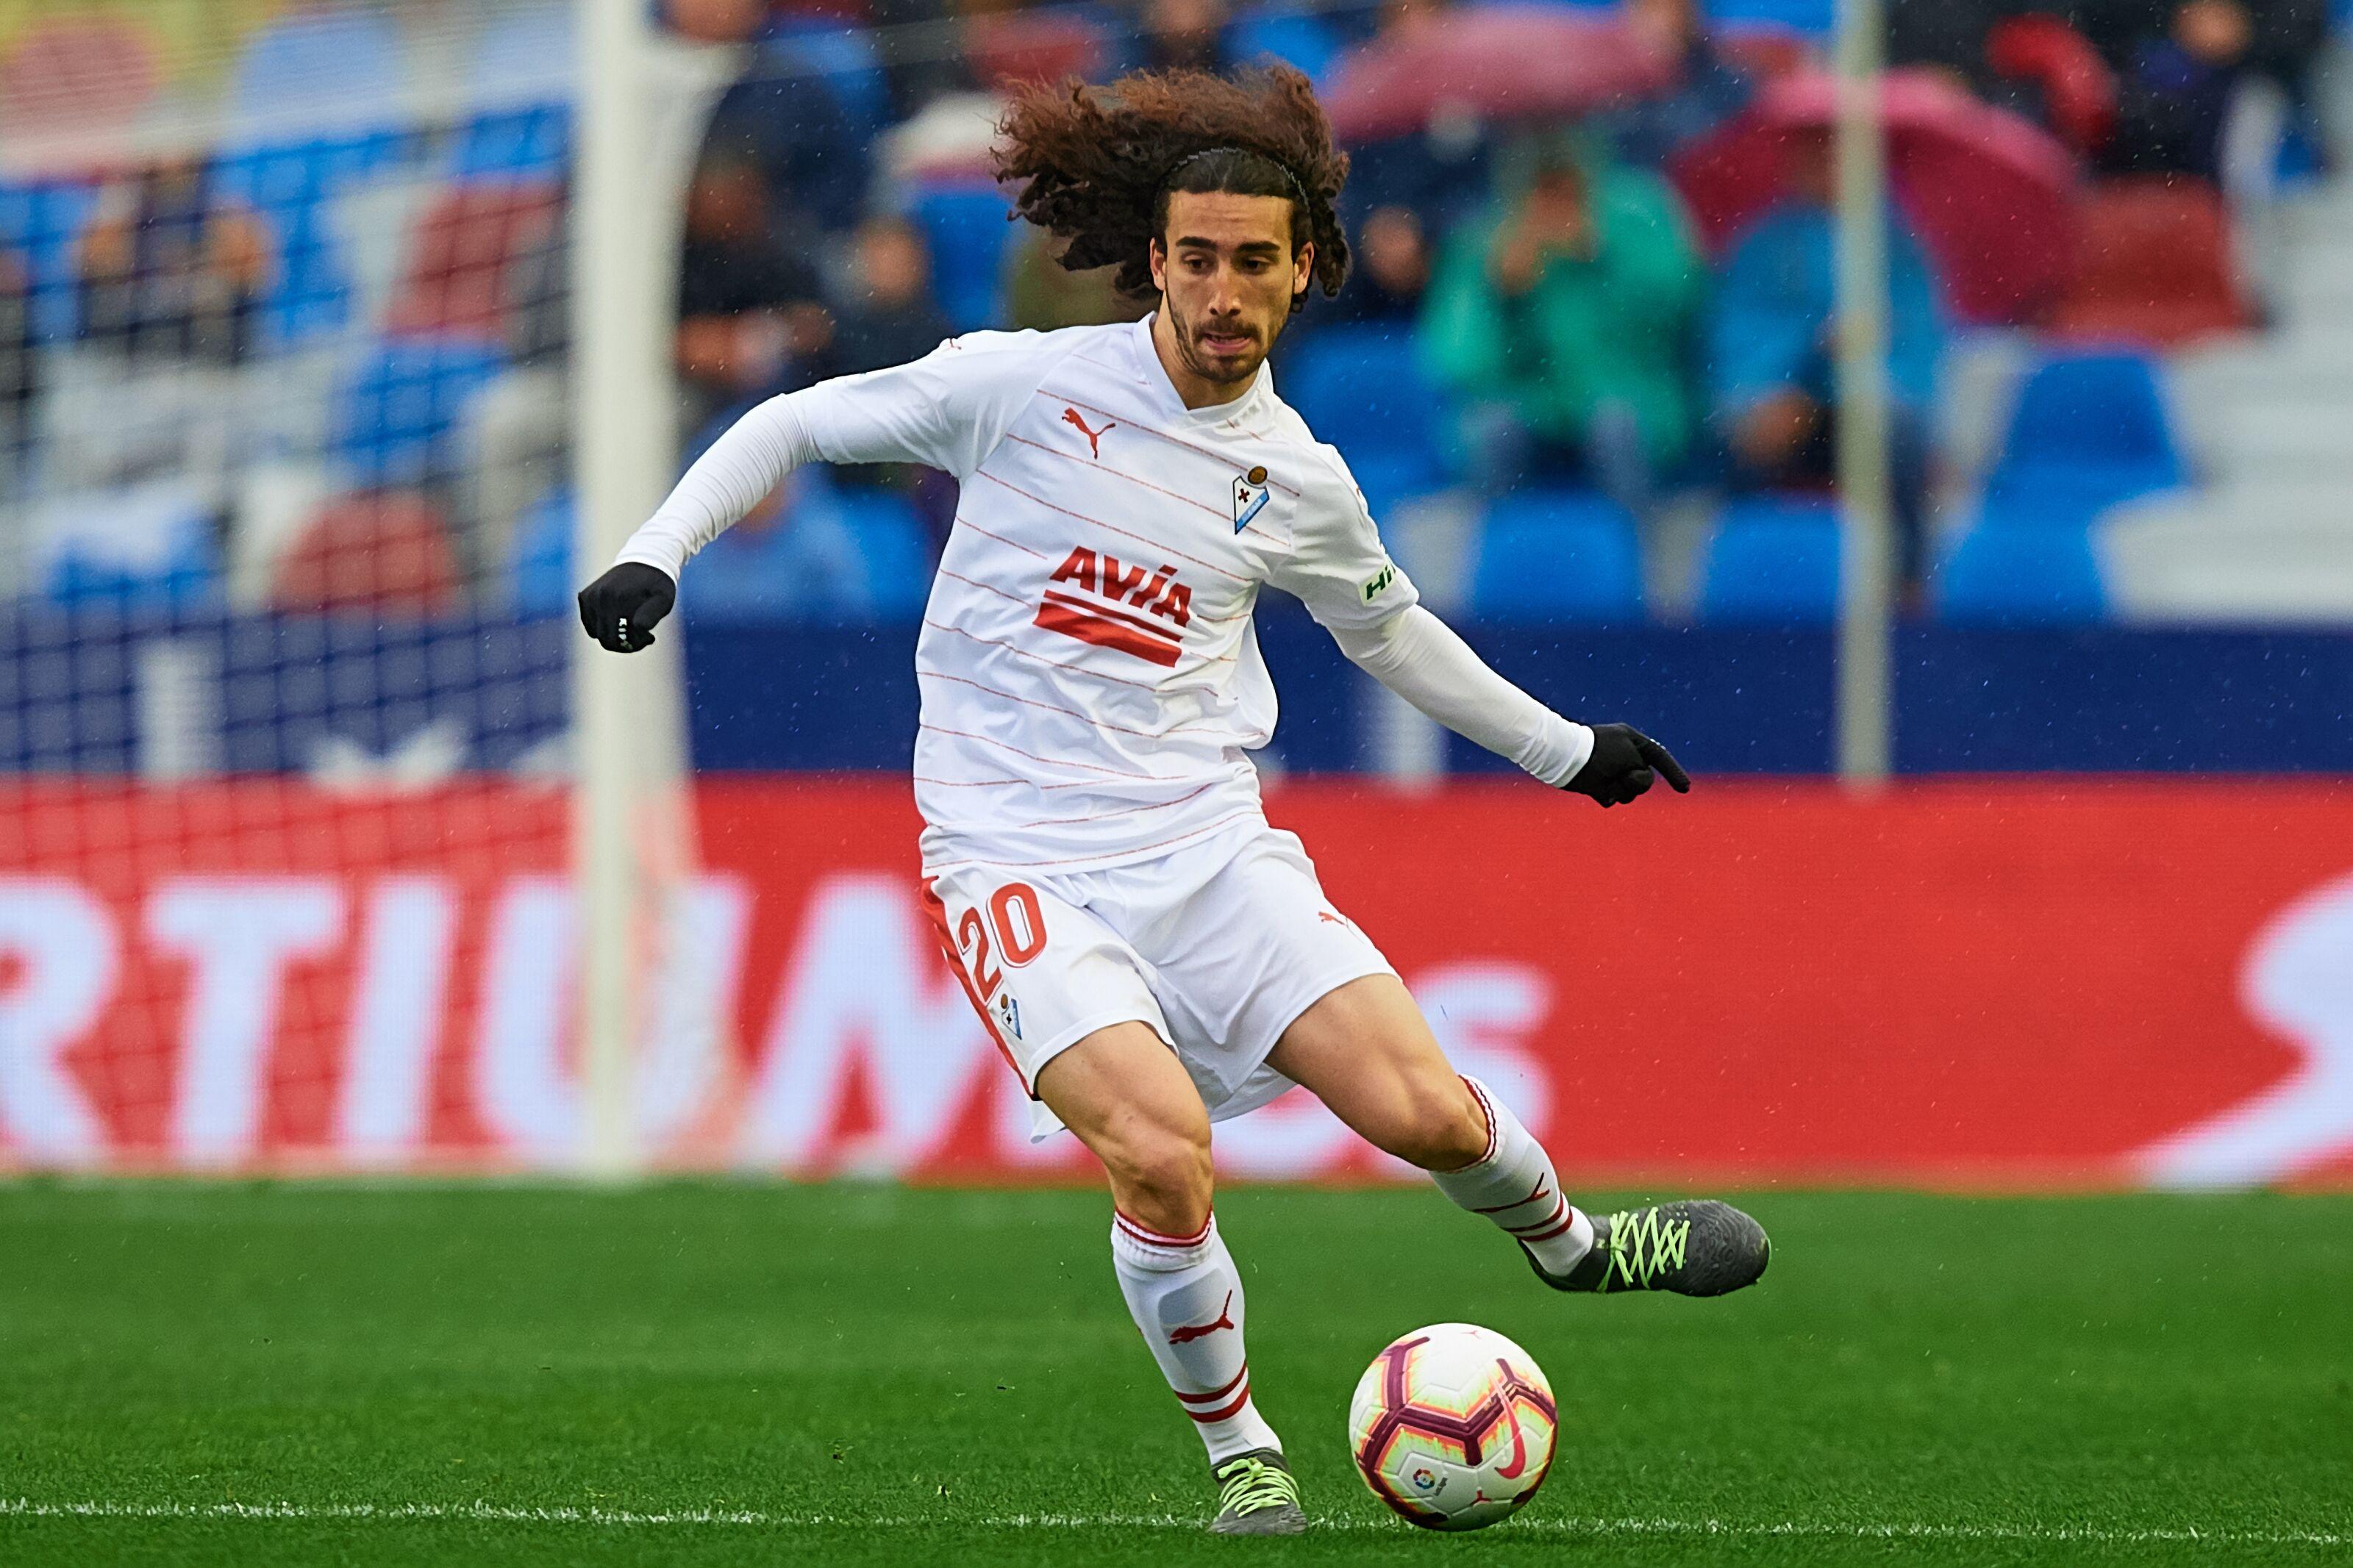 Marc Cucurella to return to Barcelona in buy-back deal